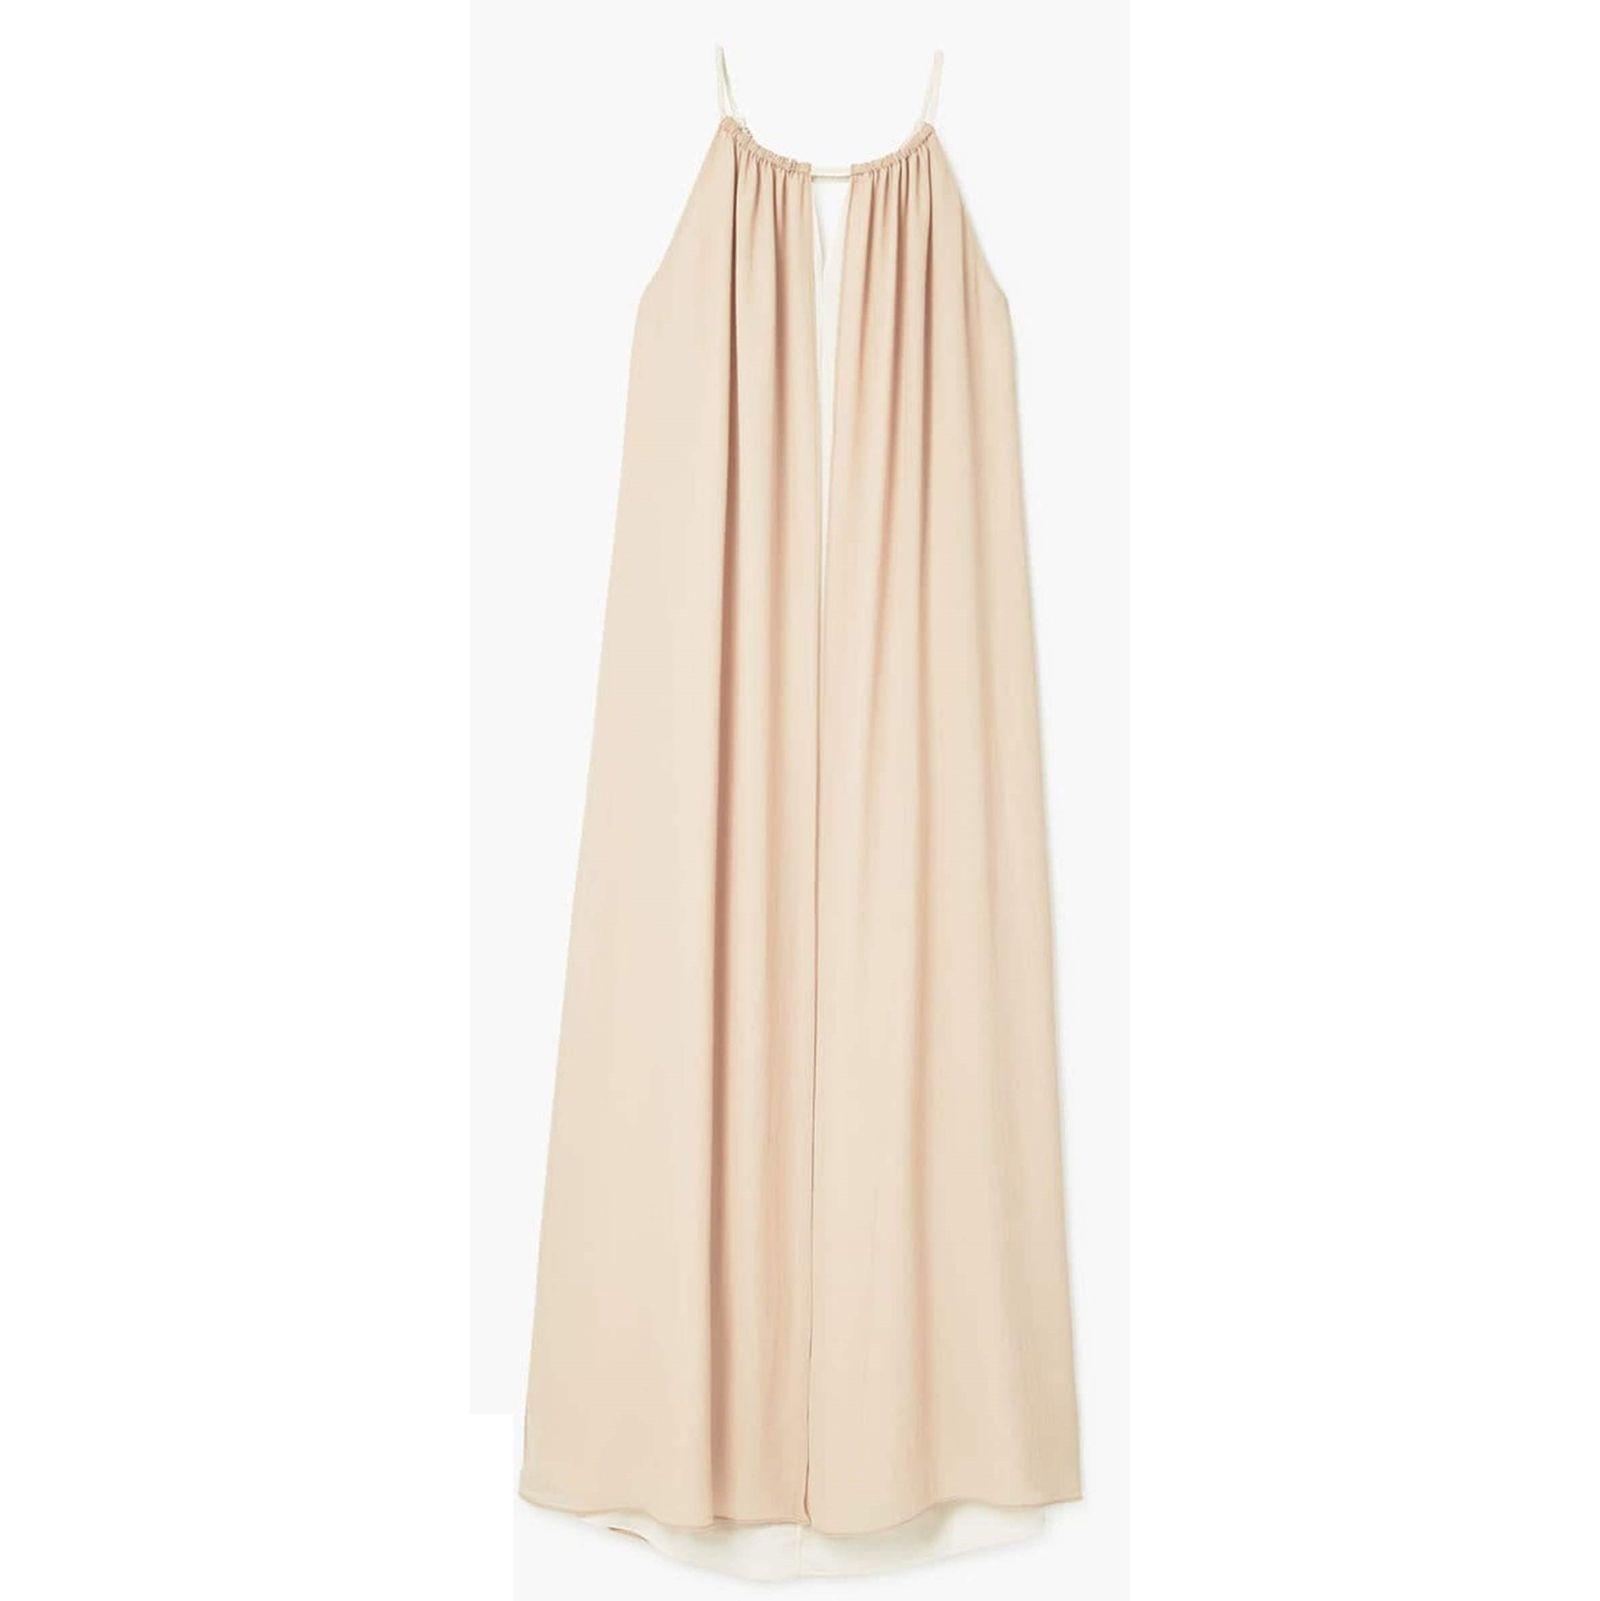 پیراهن بلند زنانه - مانگو - کرم  - 1